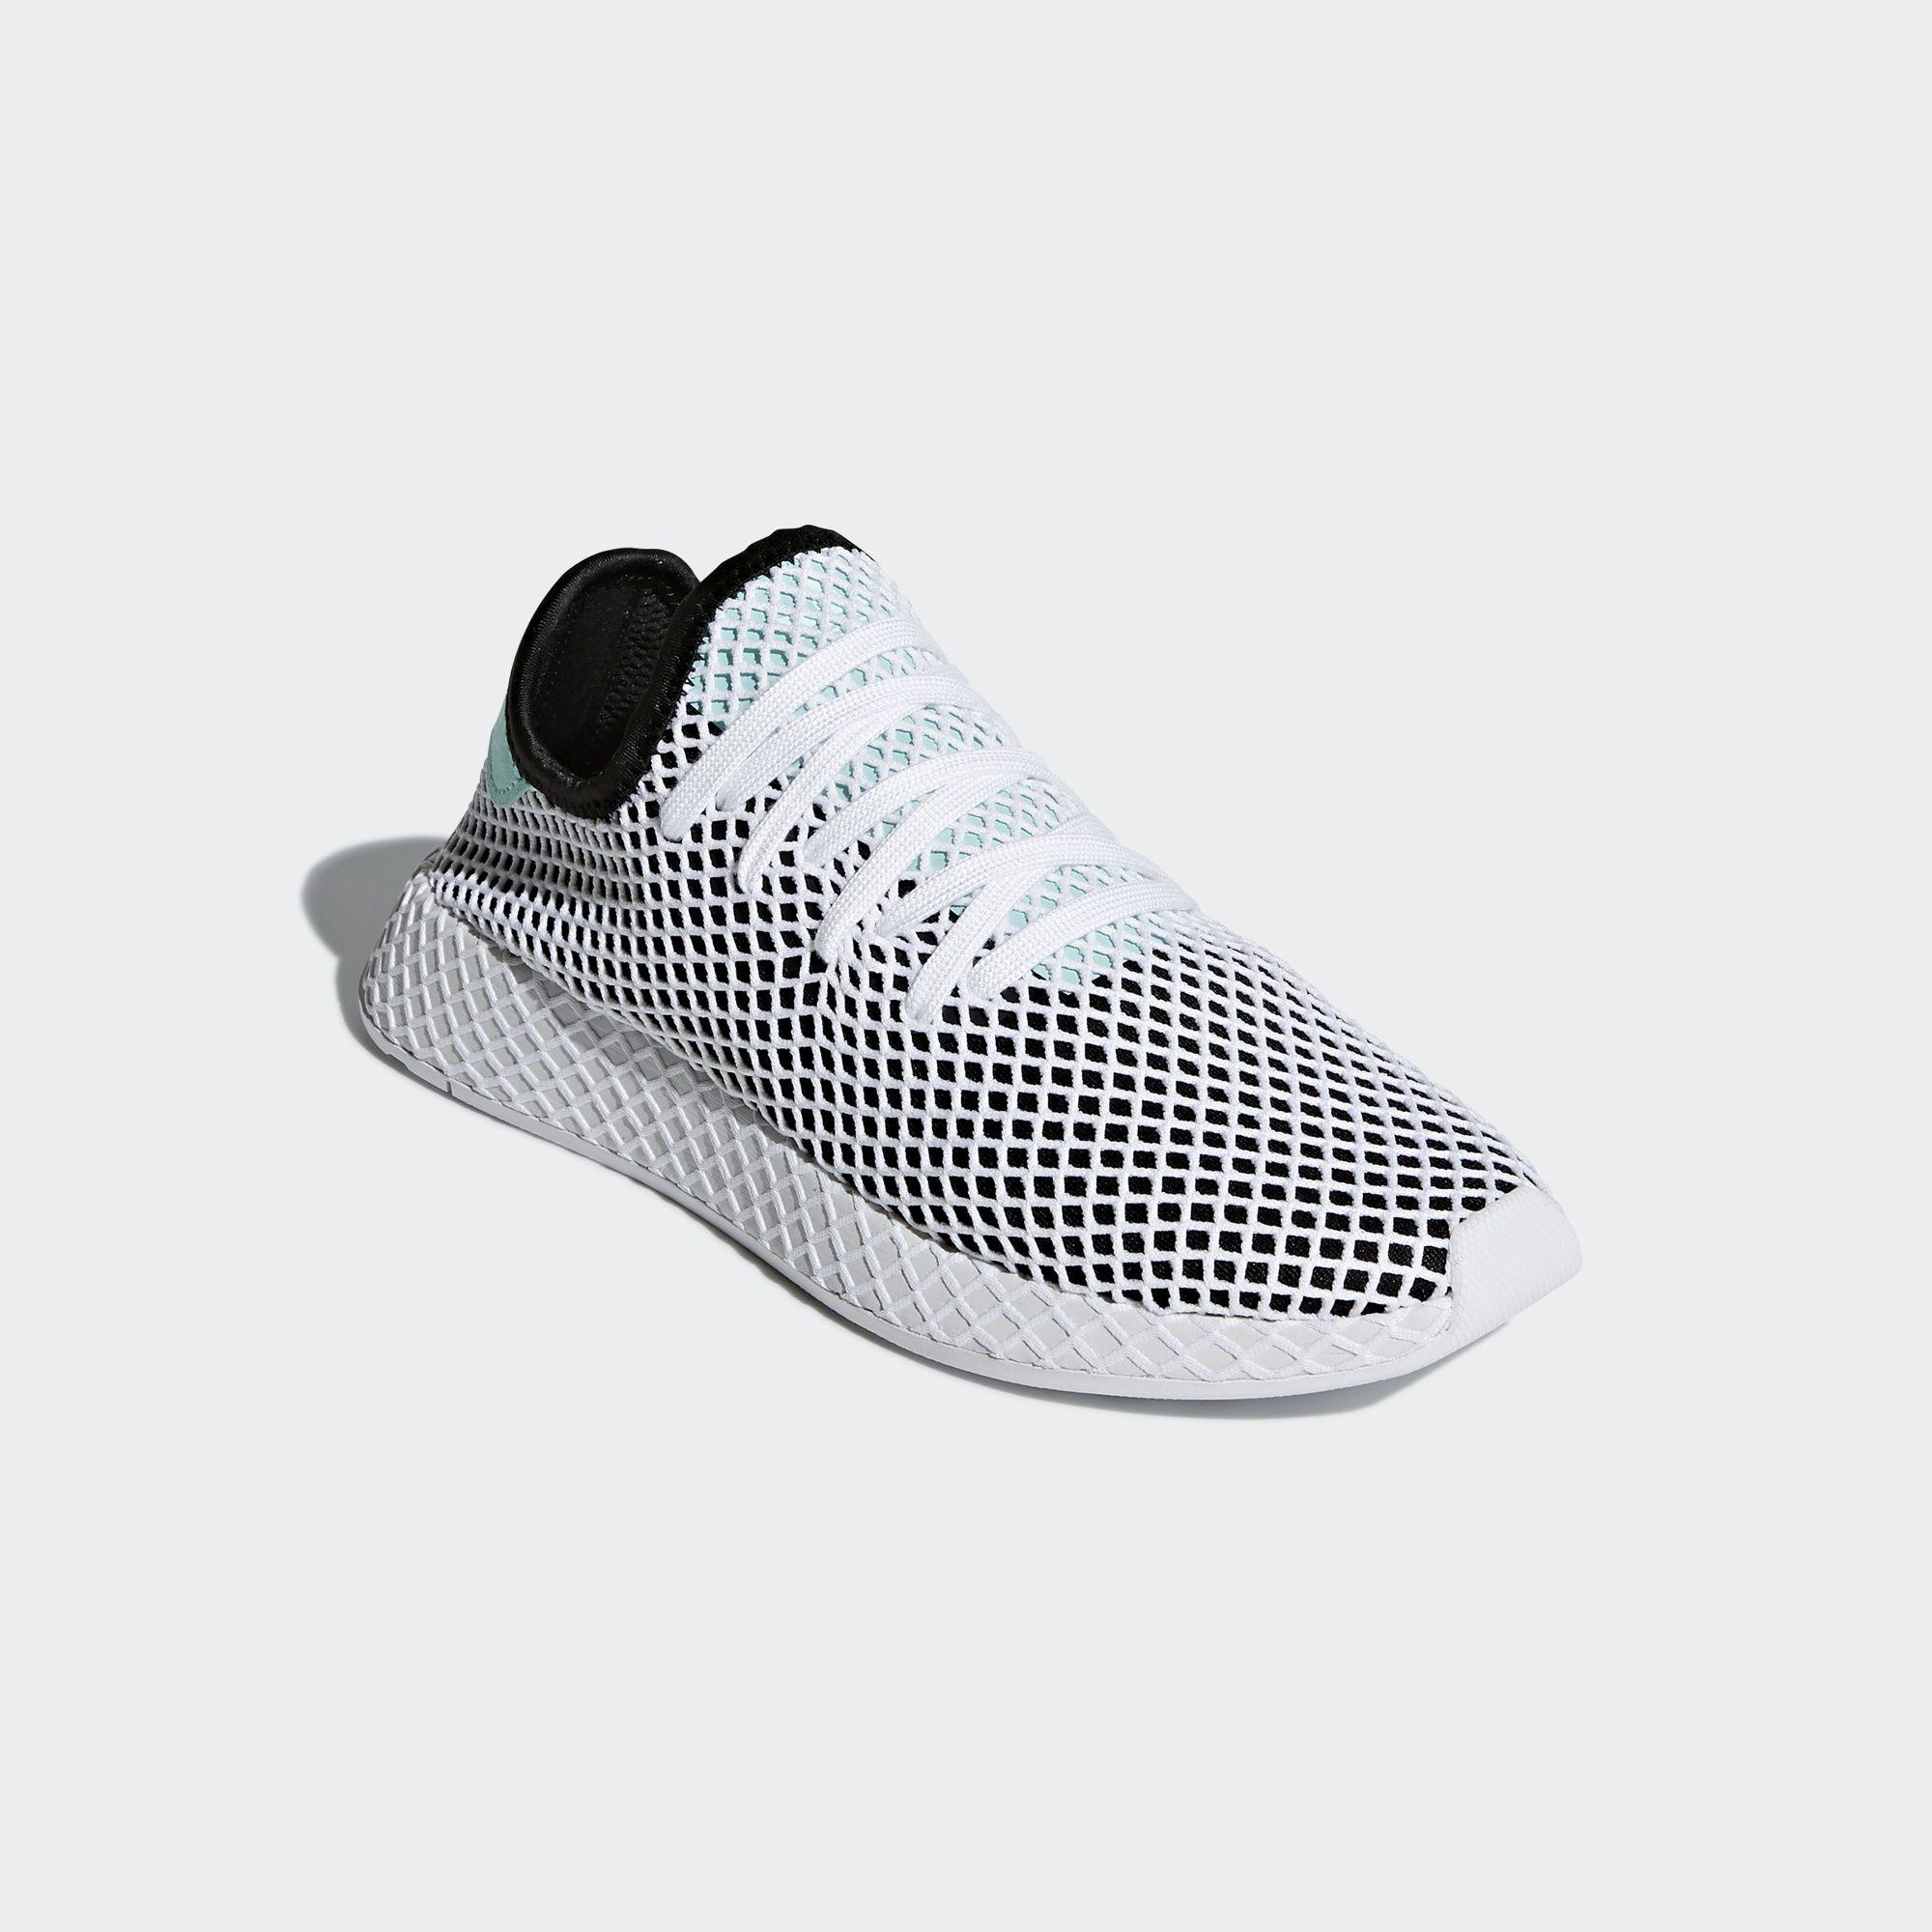 Adidas Mode Marke Schuhe Shop Damen Sportschuhe Dampf Blau